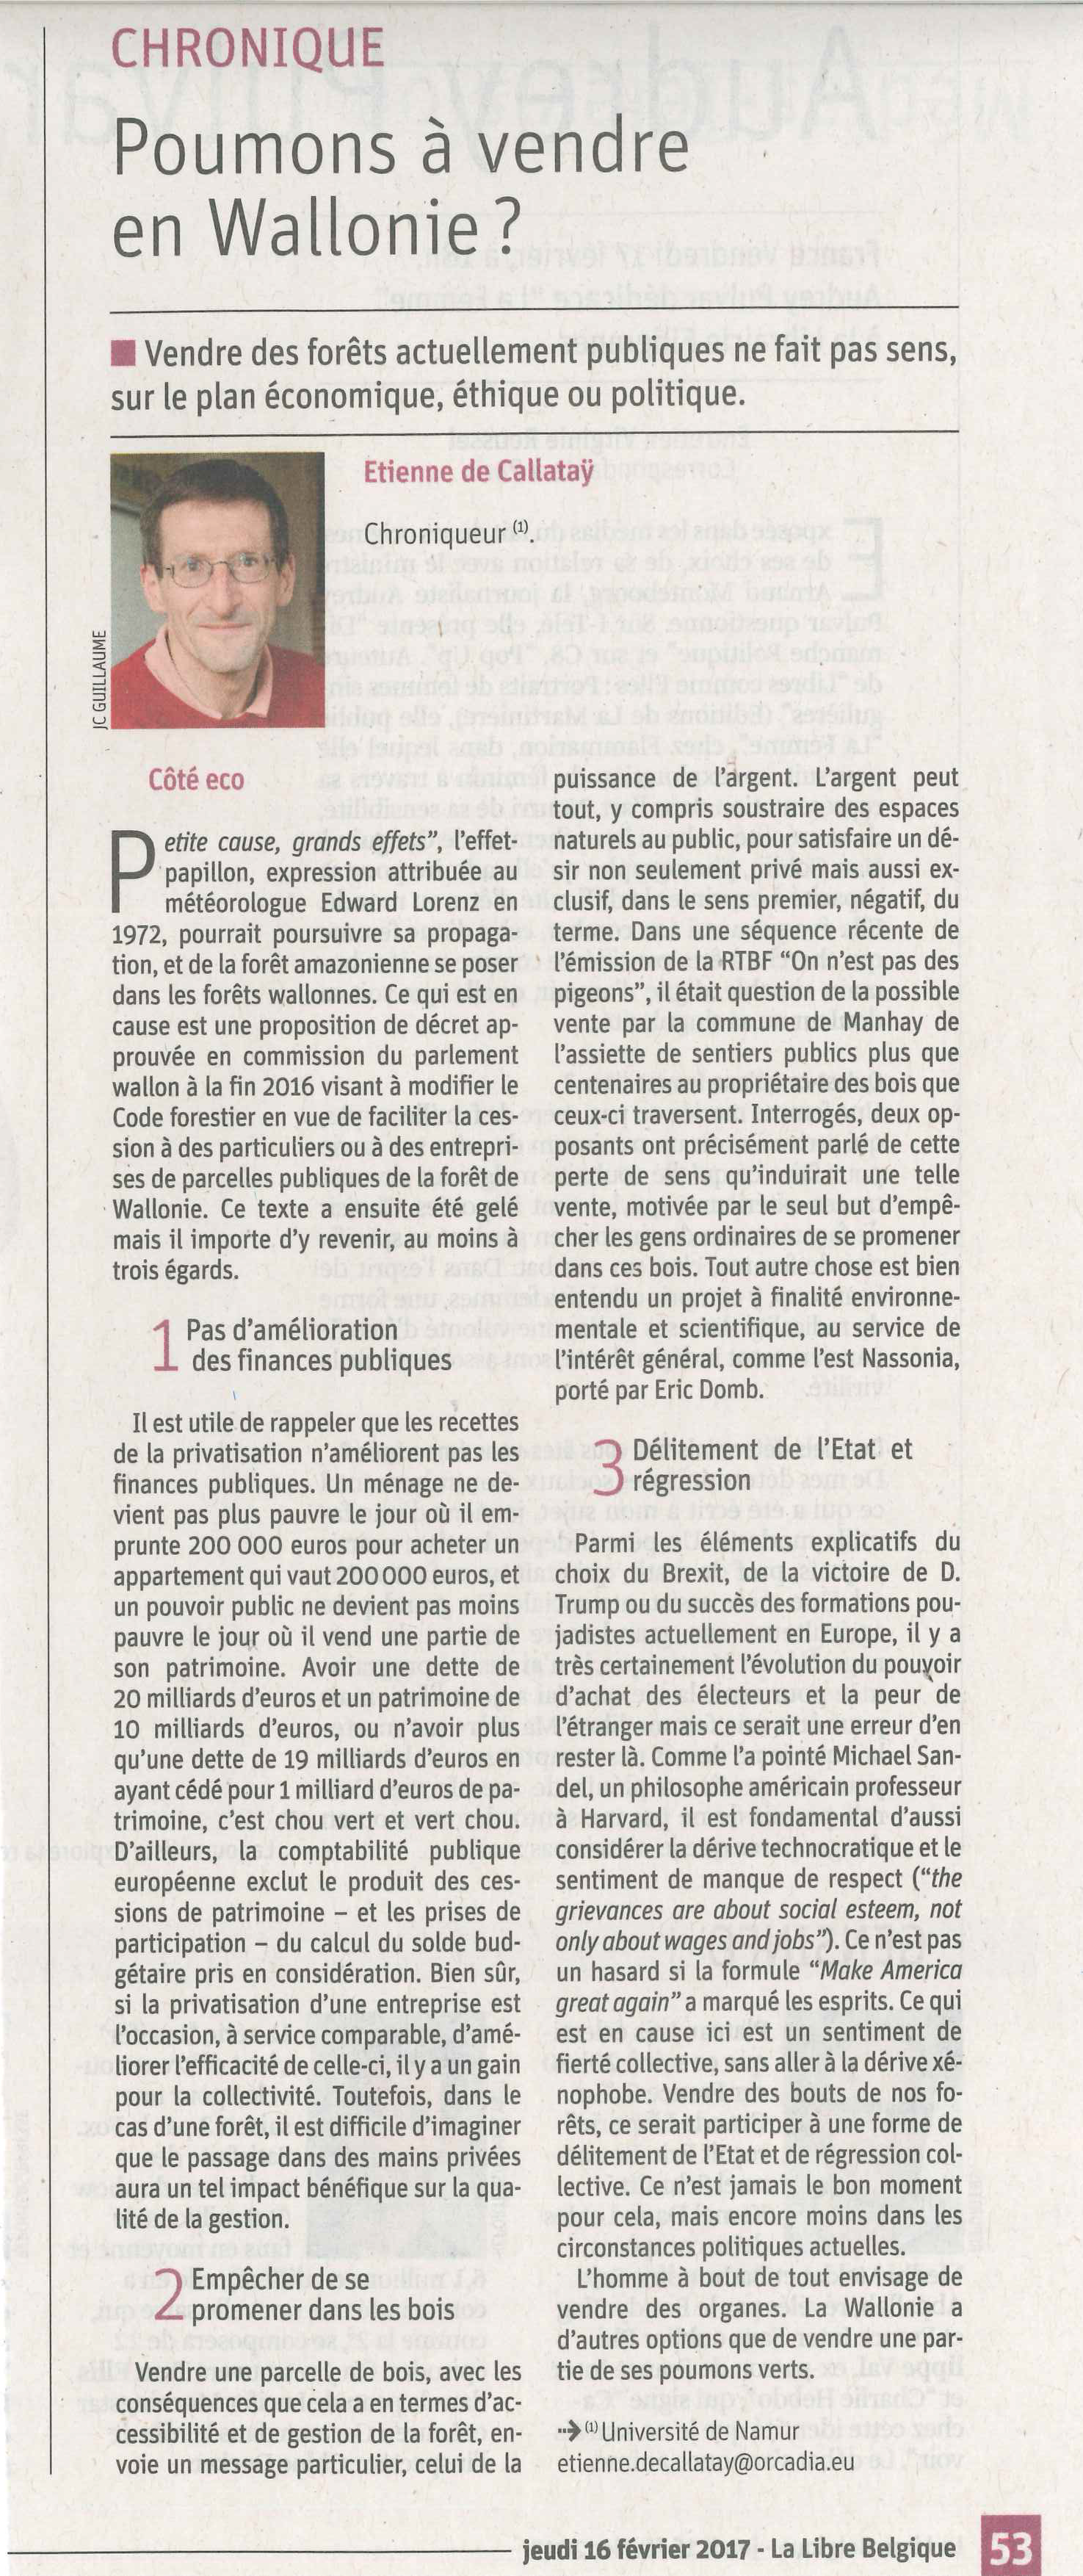 Poumons a vendre en Wallonie-E de Callatay - La Libre - 2017-02-16